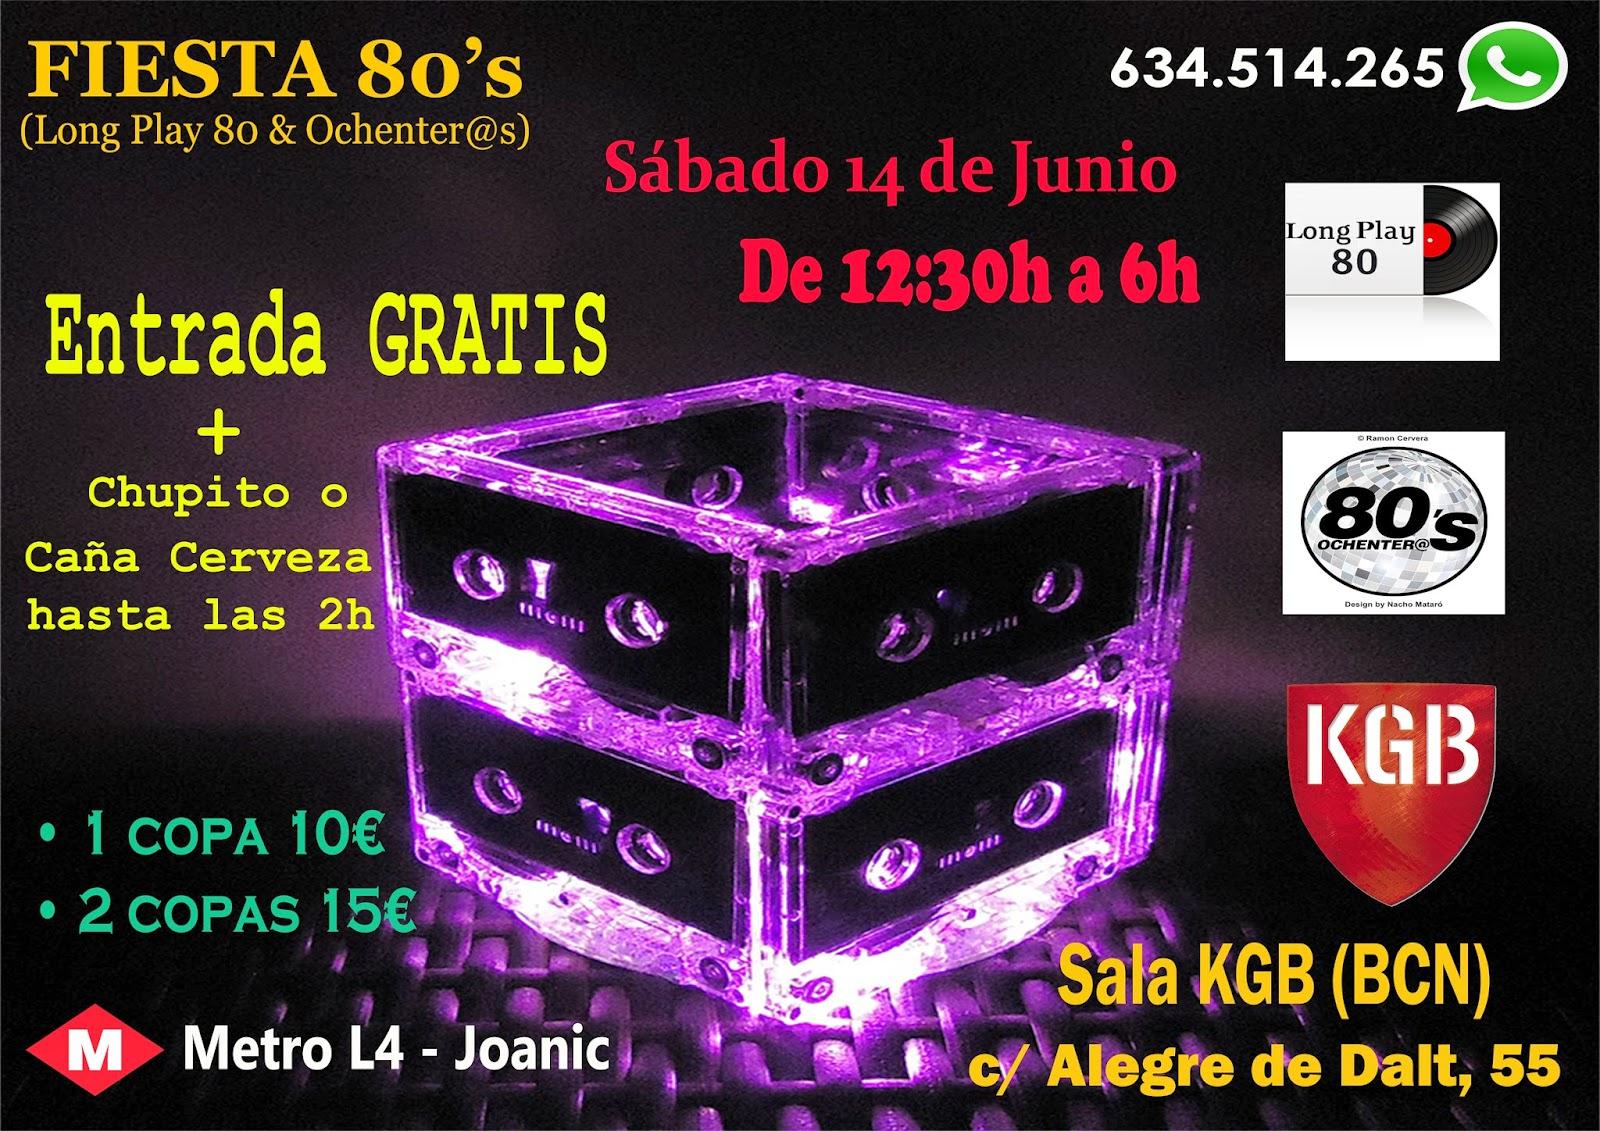 Flyer Fiesta 80's 14/06/2014